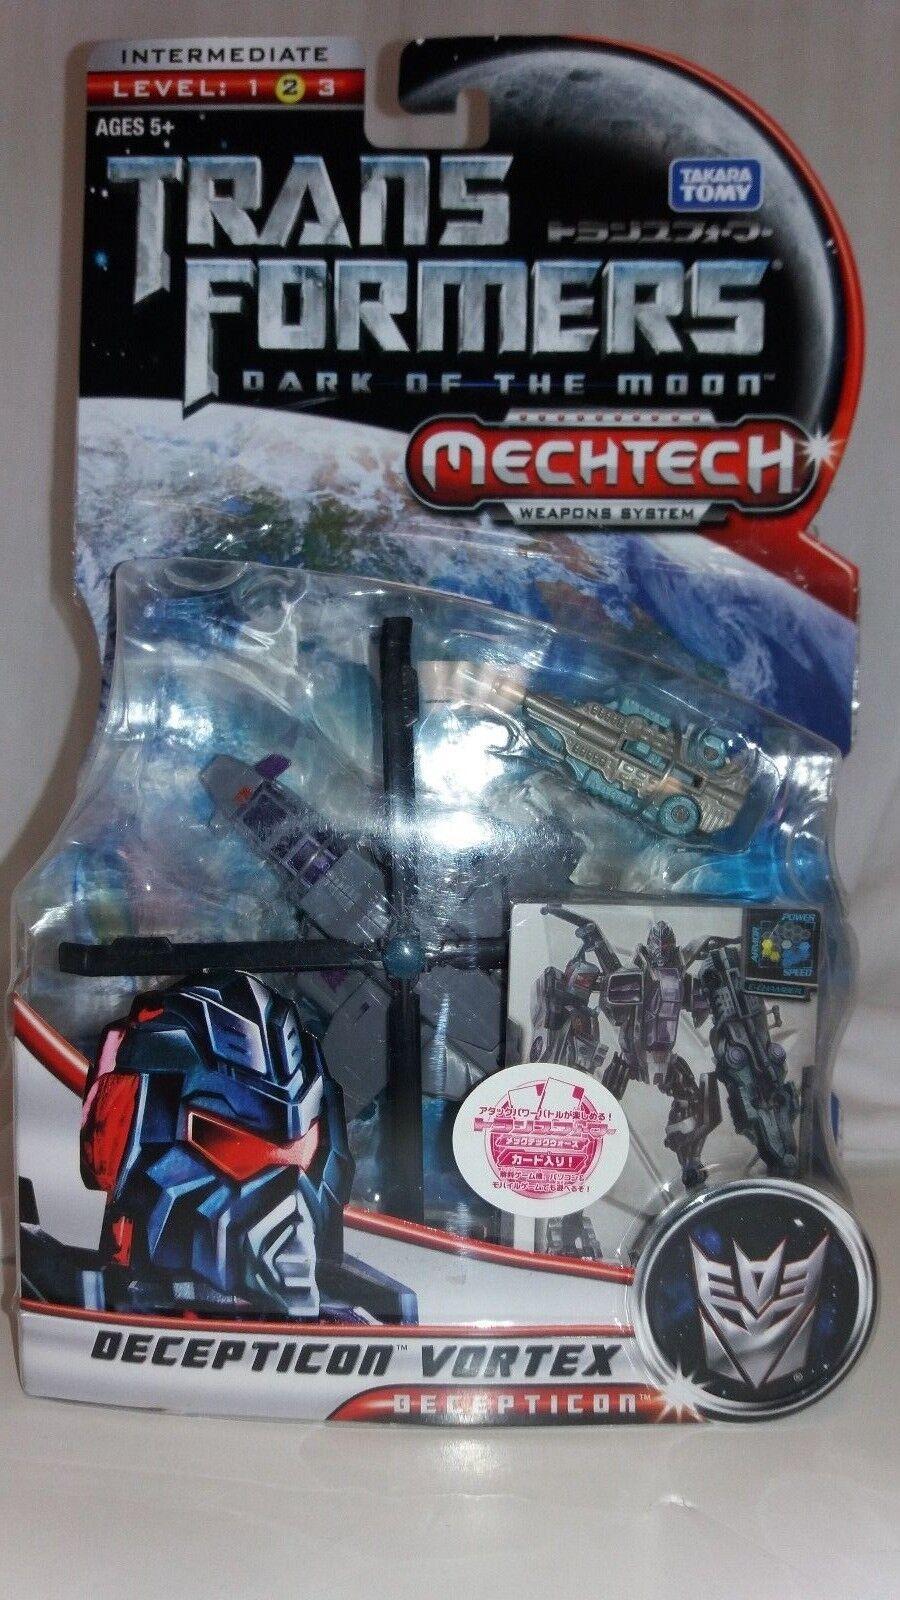 Transformers Dark Of The Moon Decepticon Vortex Mechtech Action Figure NEW